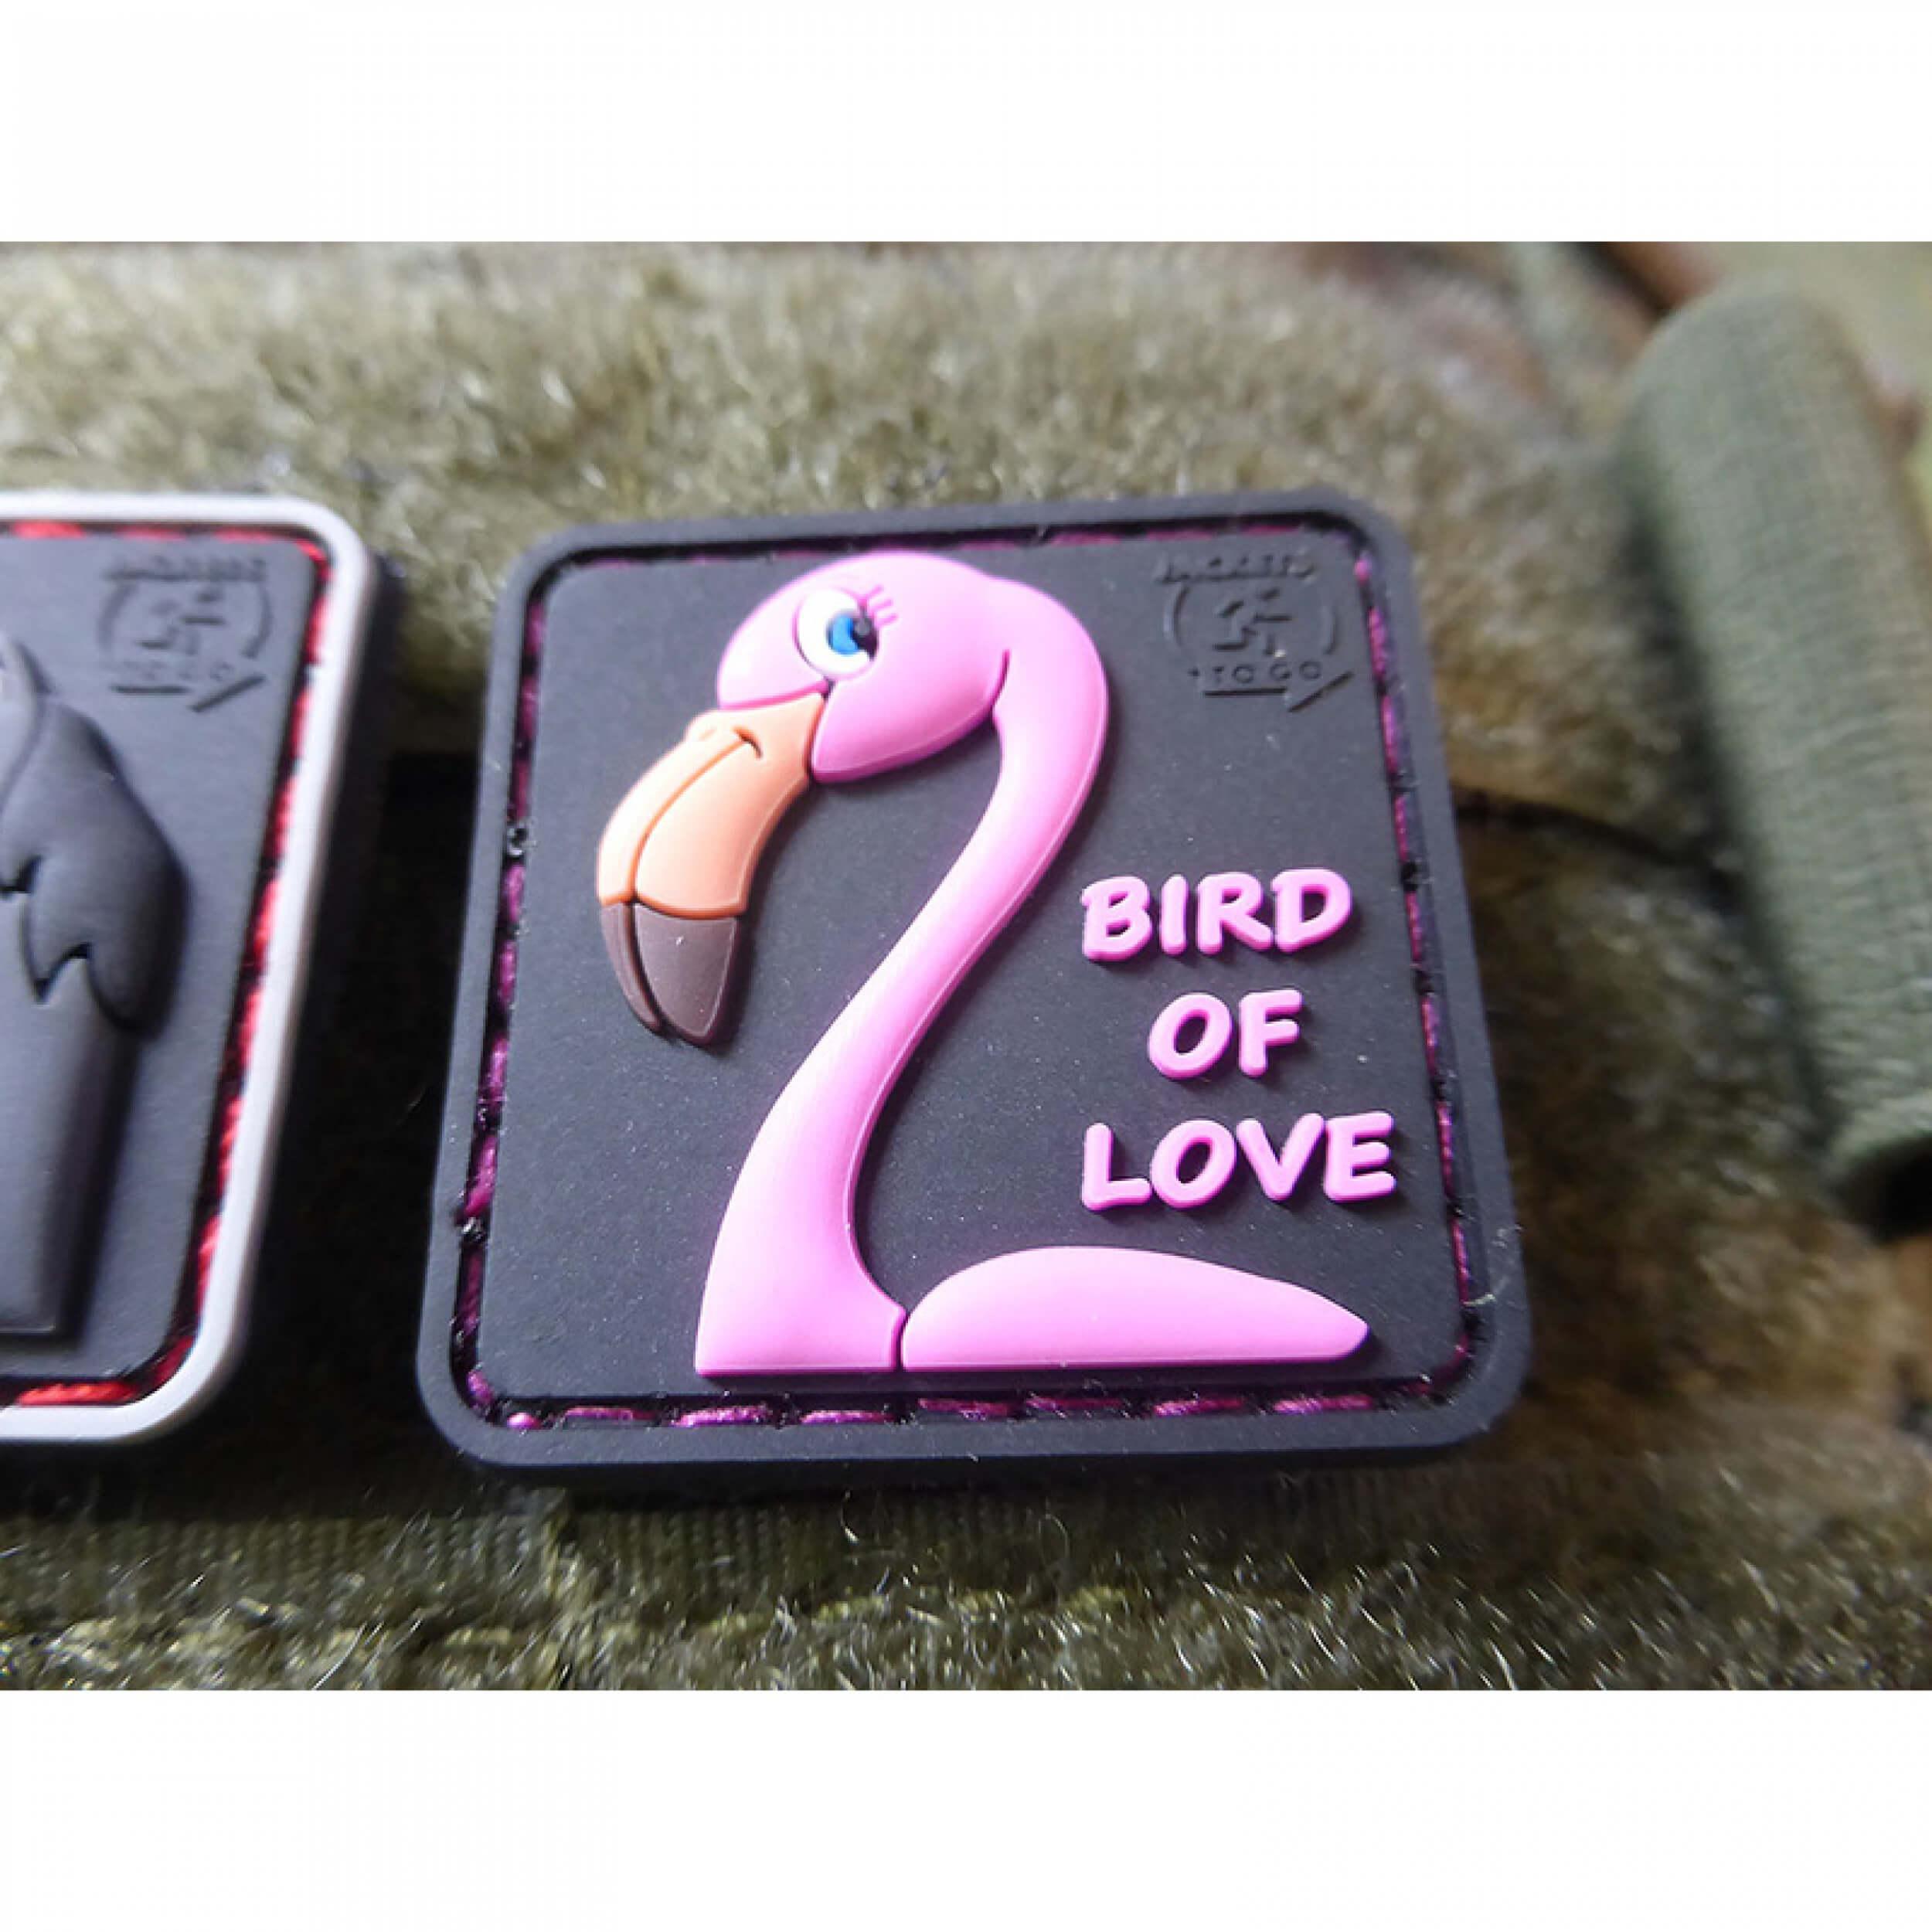 DUFT FLAMINGO Patch, Vogel der Liebe, zart duftend nach Erdbeere, limitiert / 3D Rubber Patch